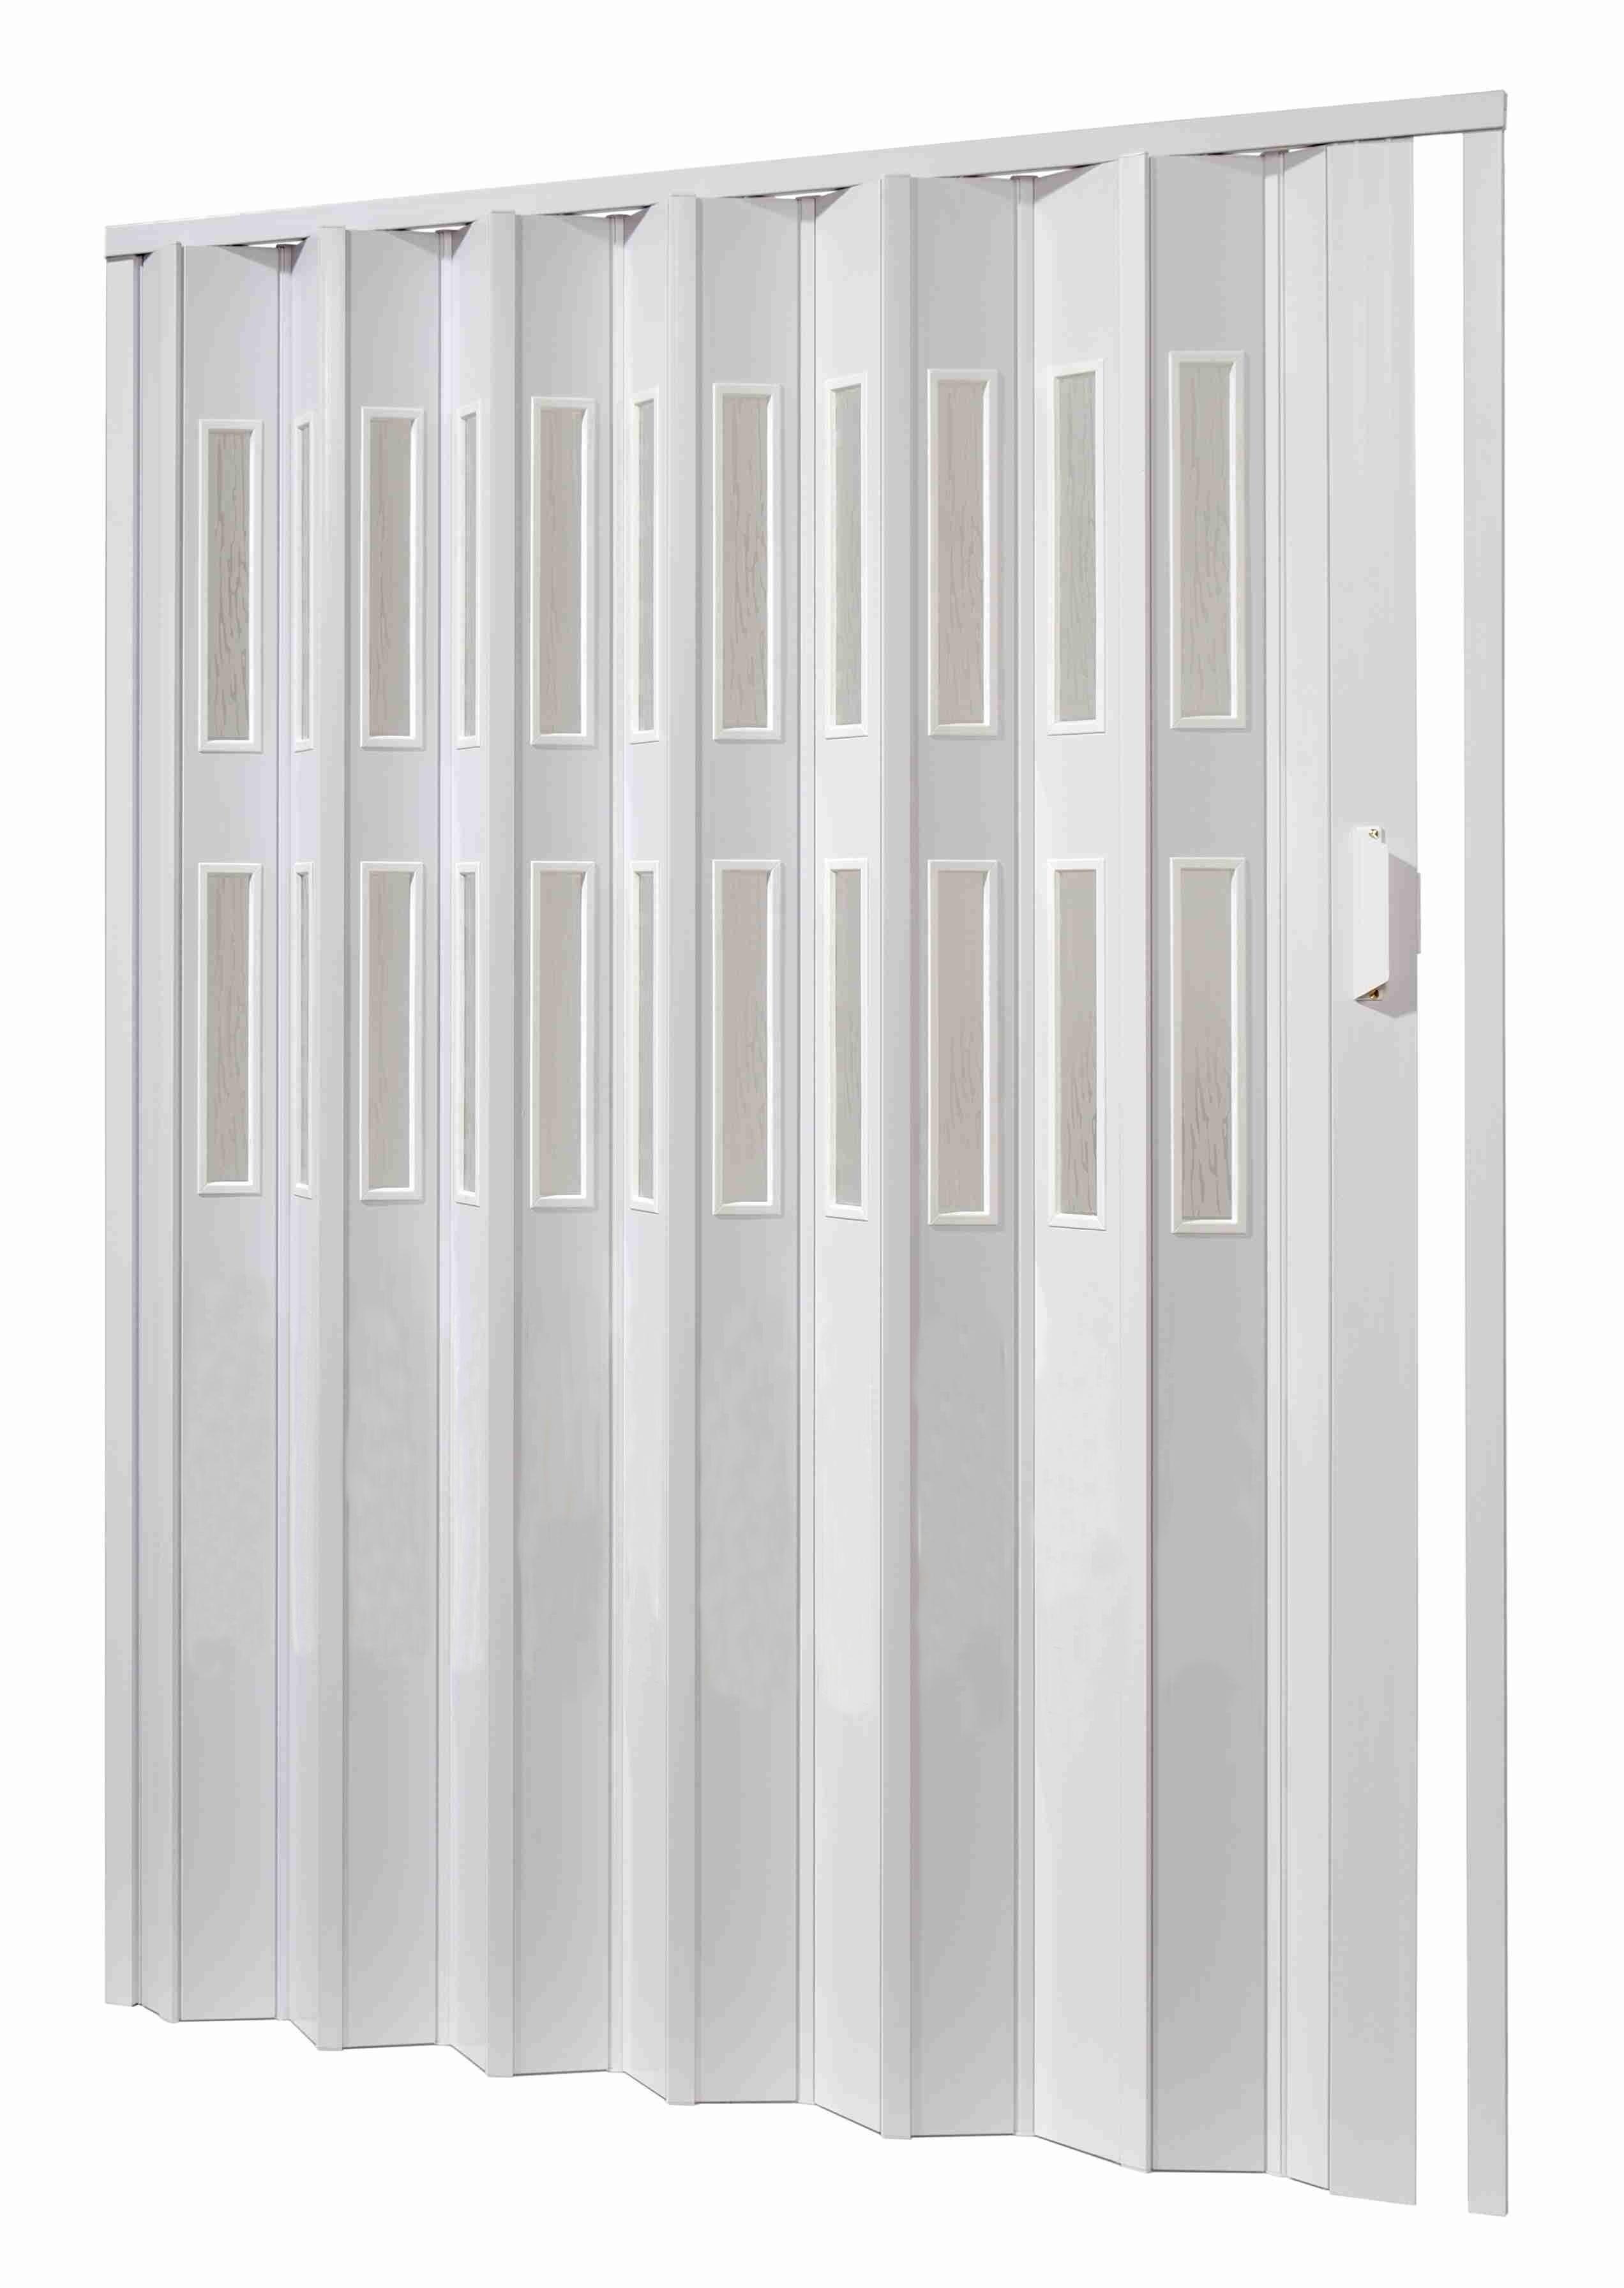 Shrnovací dveře PETROMILA rozměr do 78-83x200cm ODSTÍN: BÍLÁ, TYP DVEŘÍ: plné